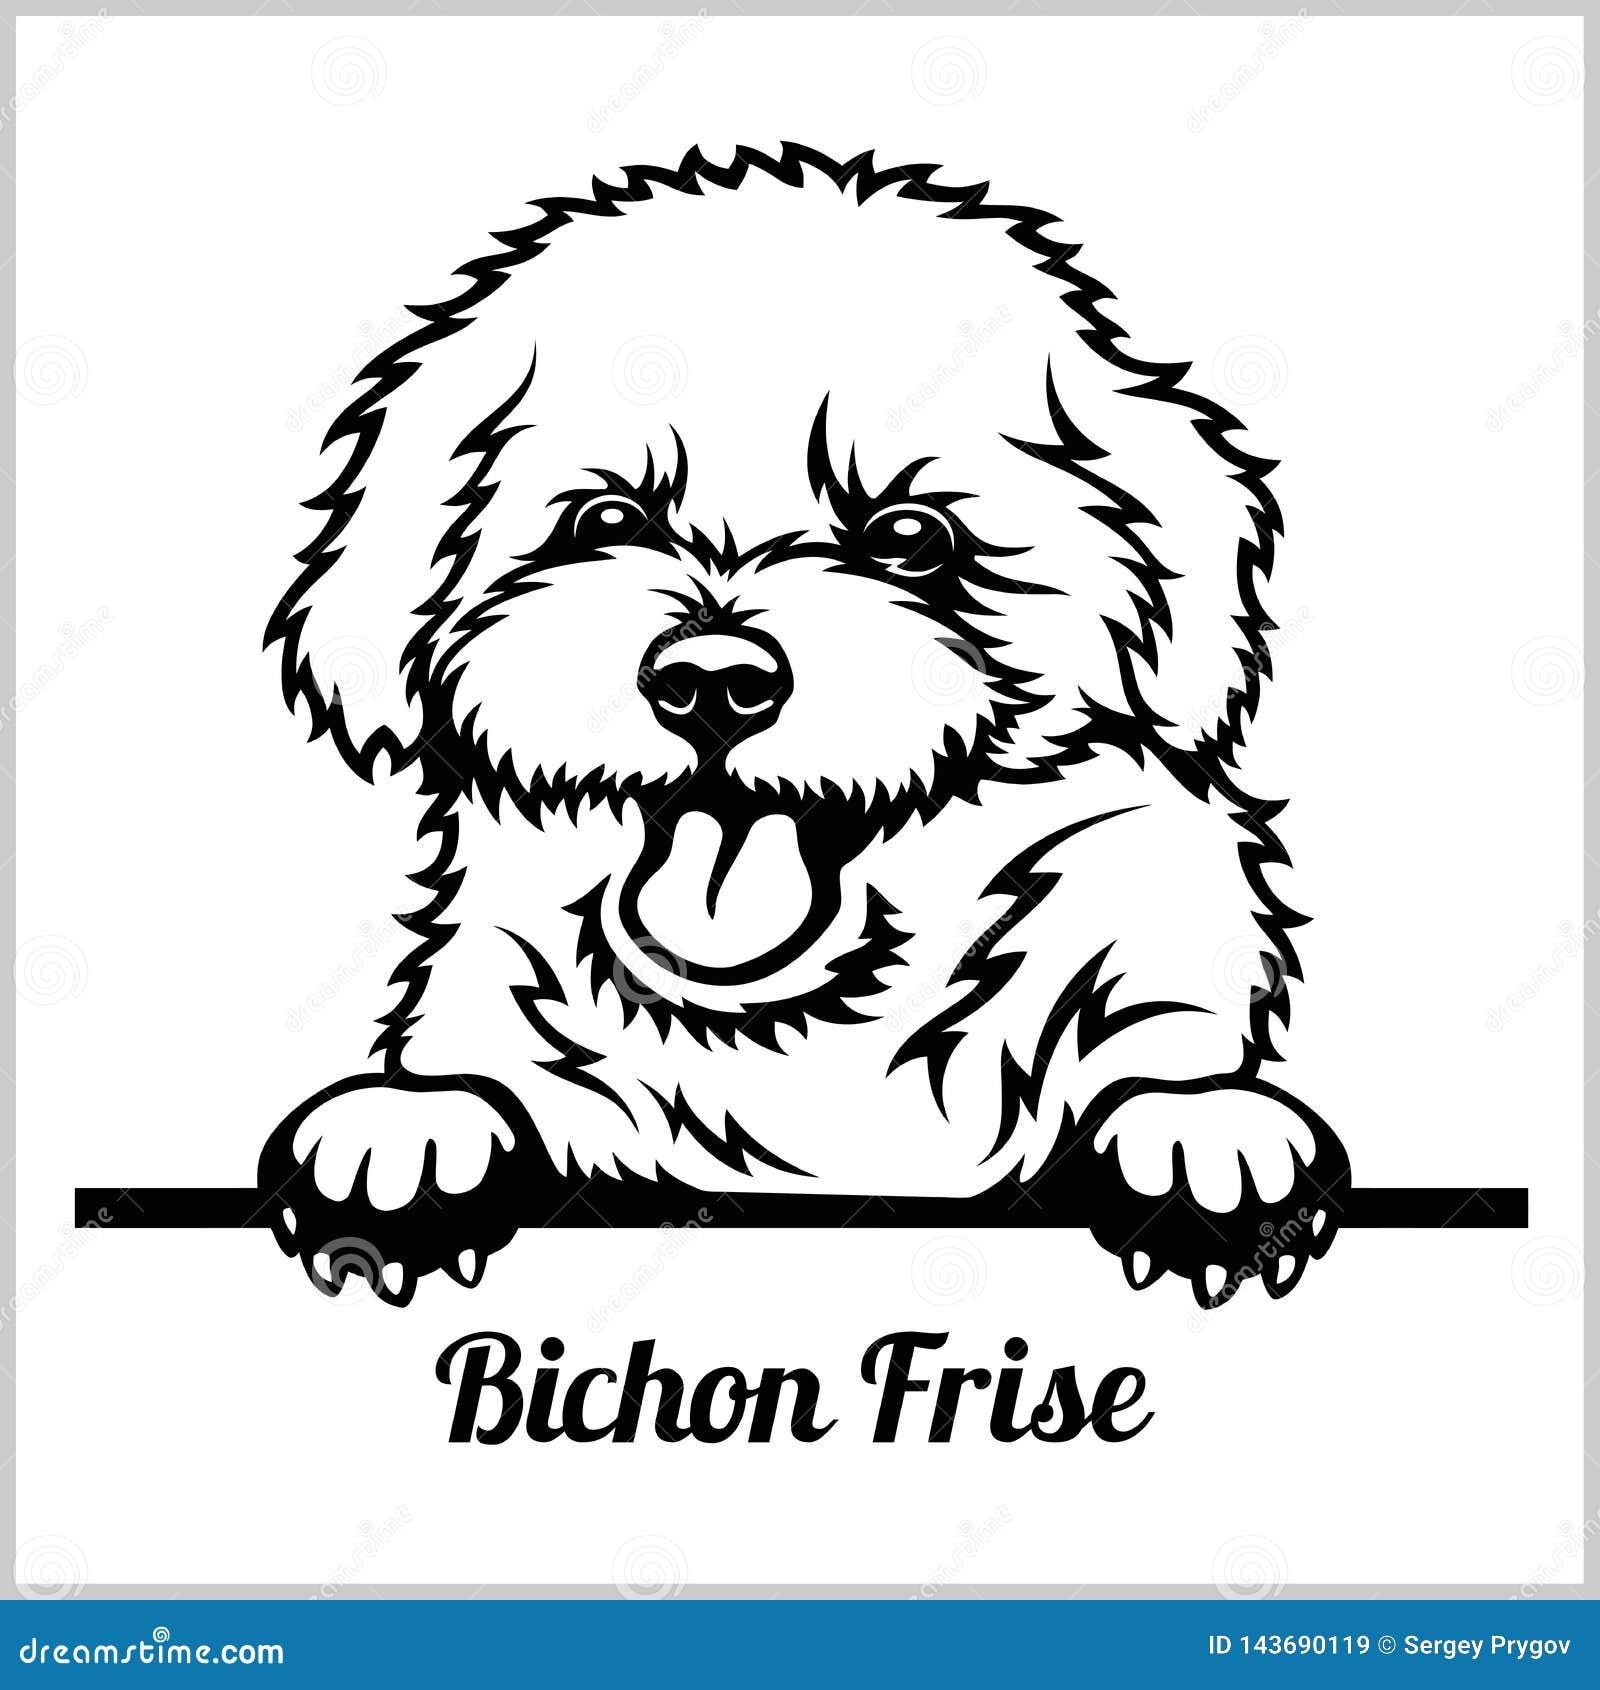 Bichon Frise Stock Illustrations 209 Bichon Frise Stock Illustrations Vectors Clipart Dreamstime